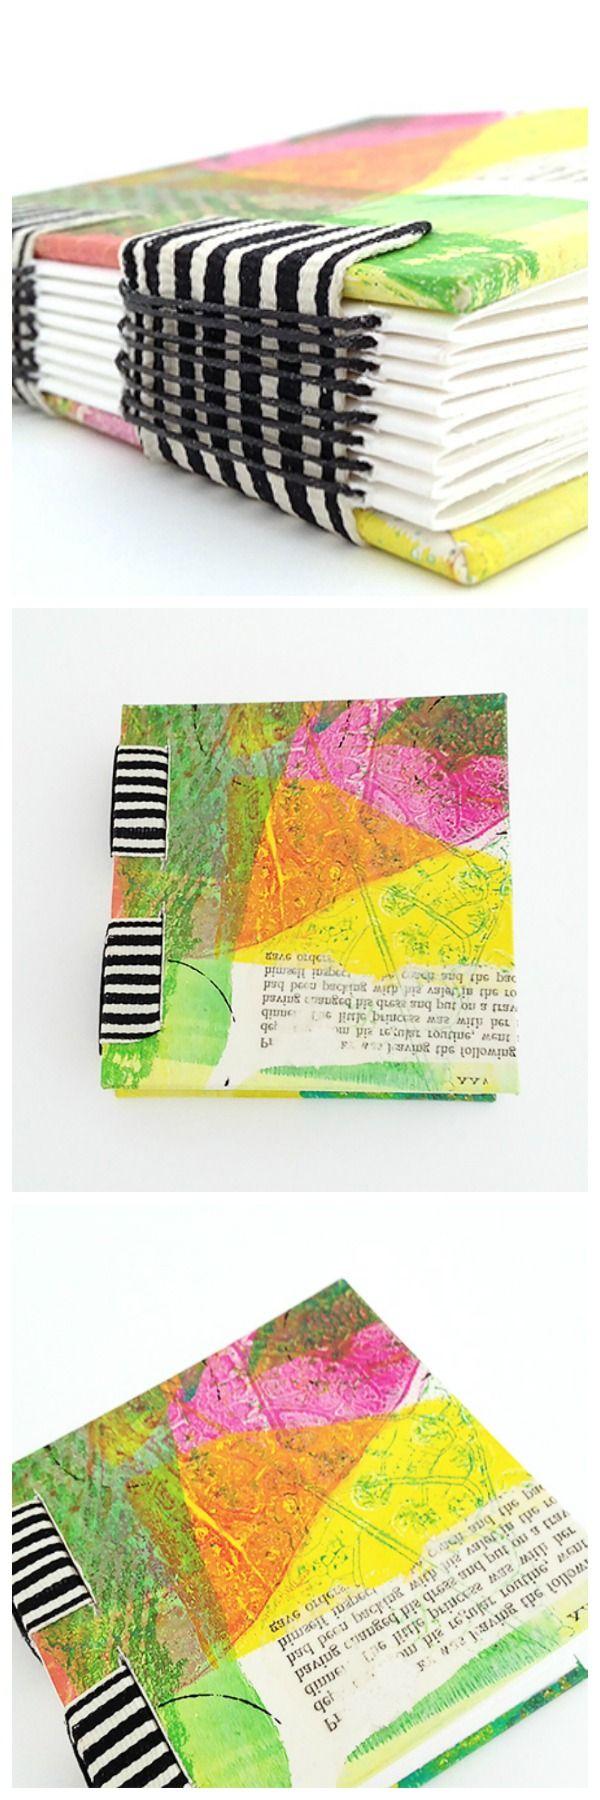 "Mini 4"" x 4"" book with a #gelli print cover and ribbon binding."